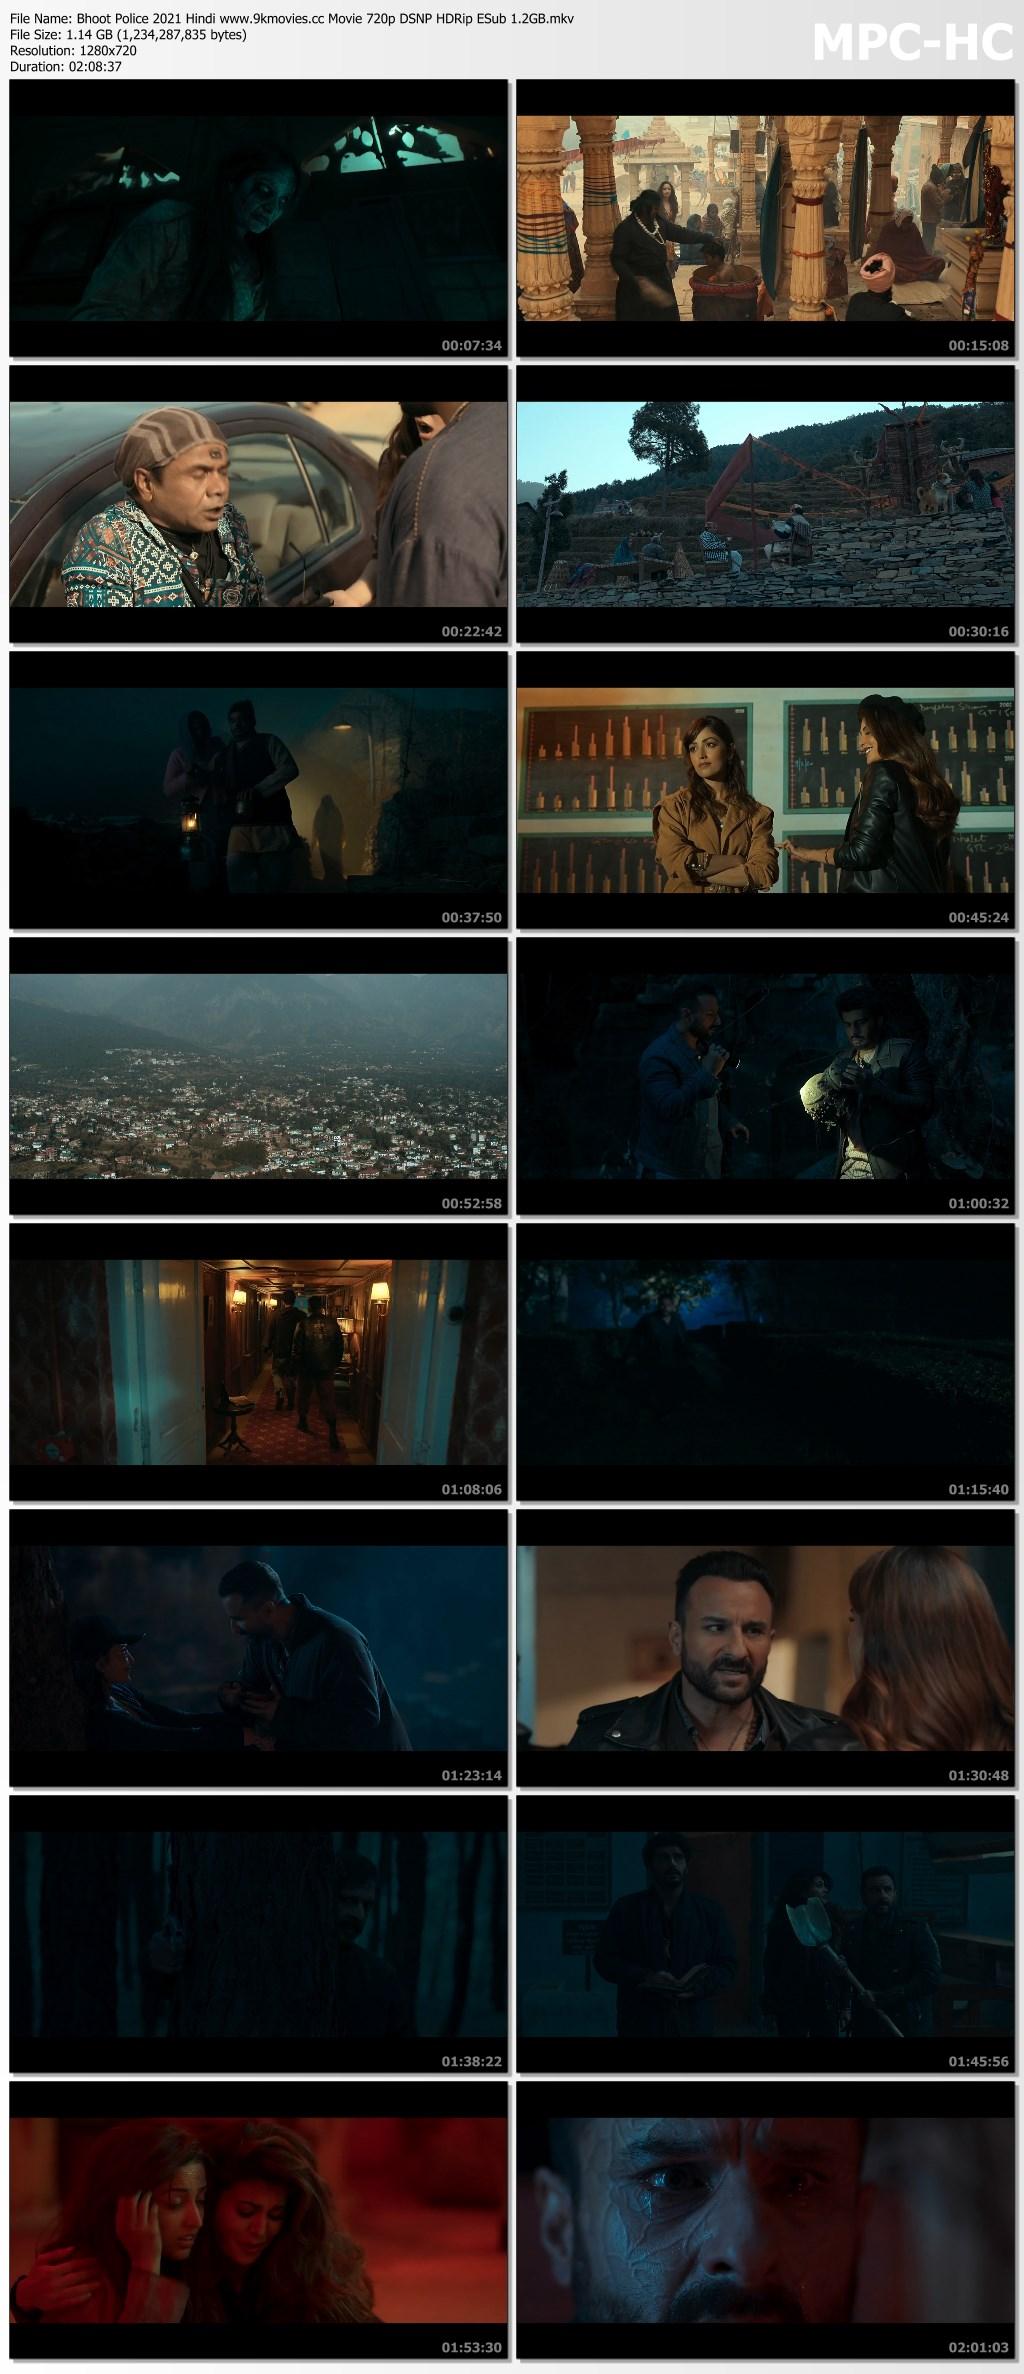 [SCREENSHOT] Bhoot Police 2021 Hindi Movie 720p 1080p HDRip ESub Download